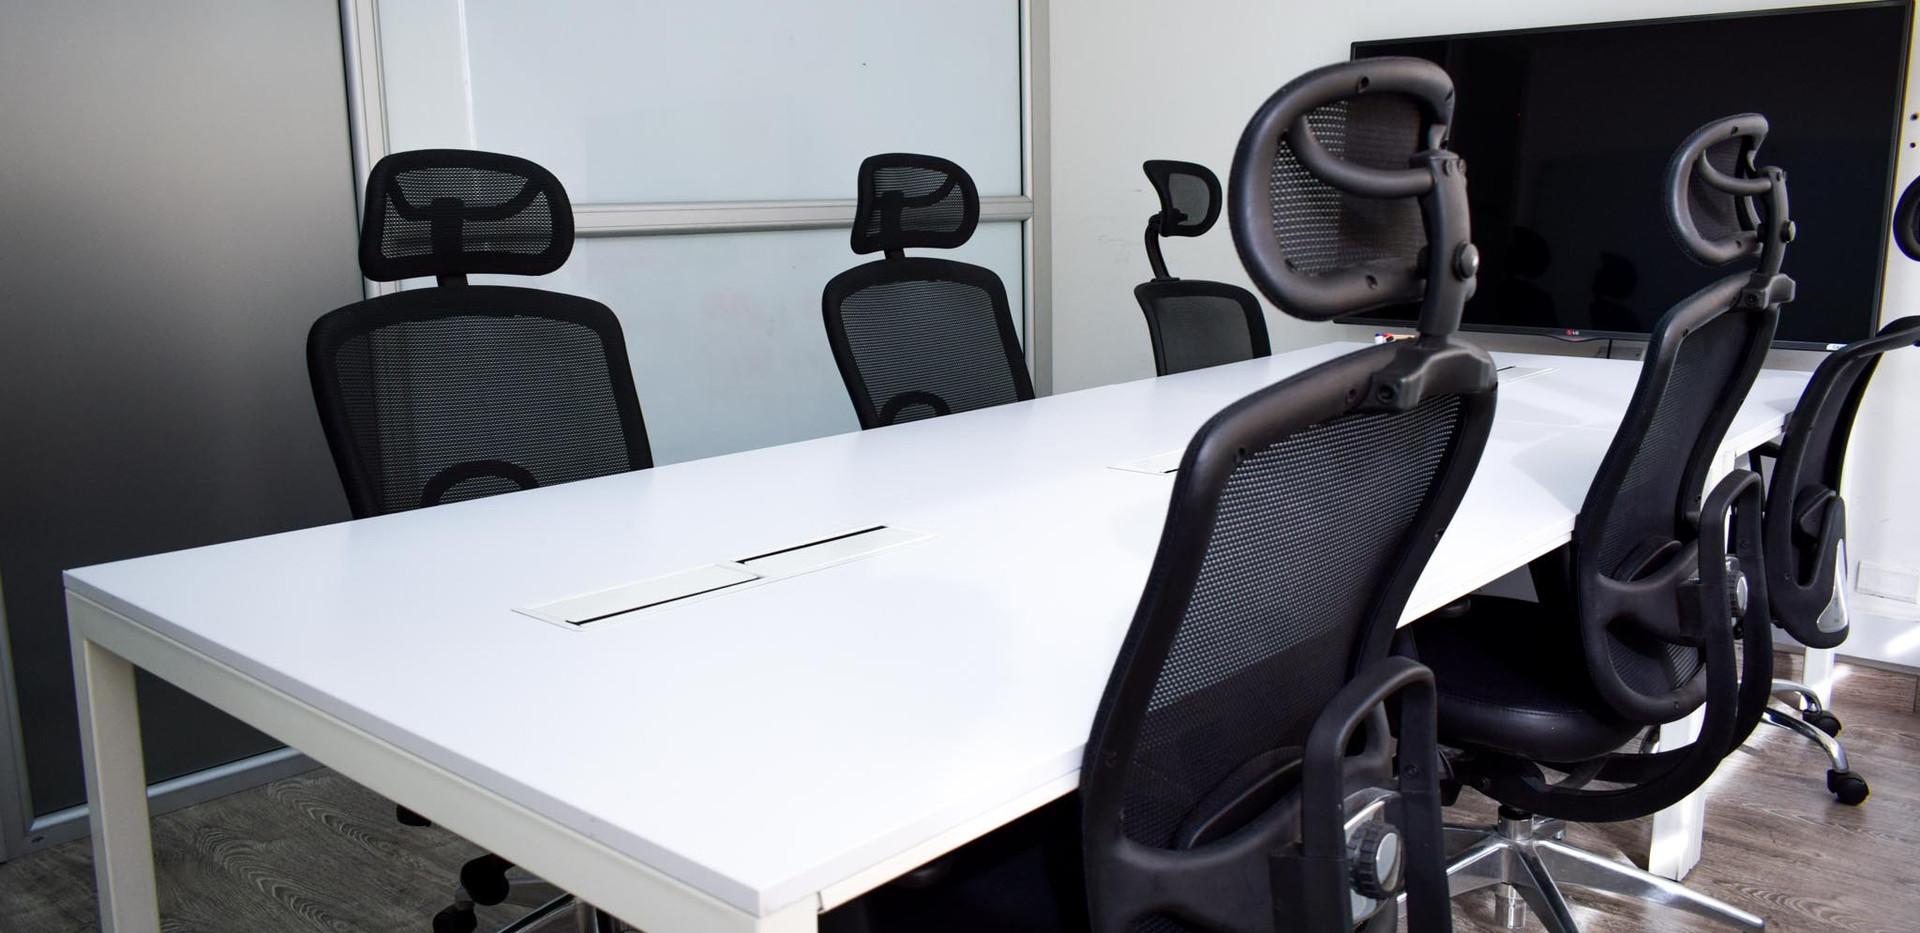 sala-de-reuniones-por hora.jpg